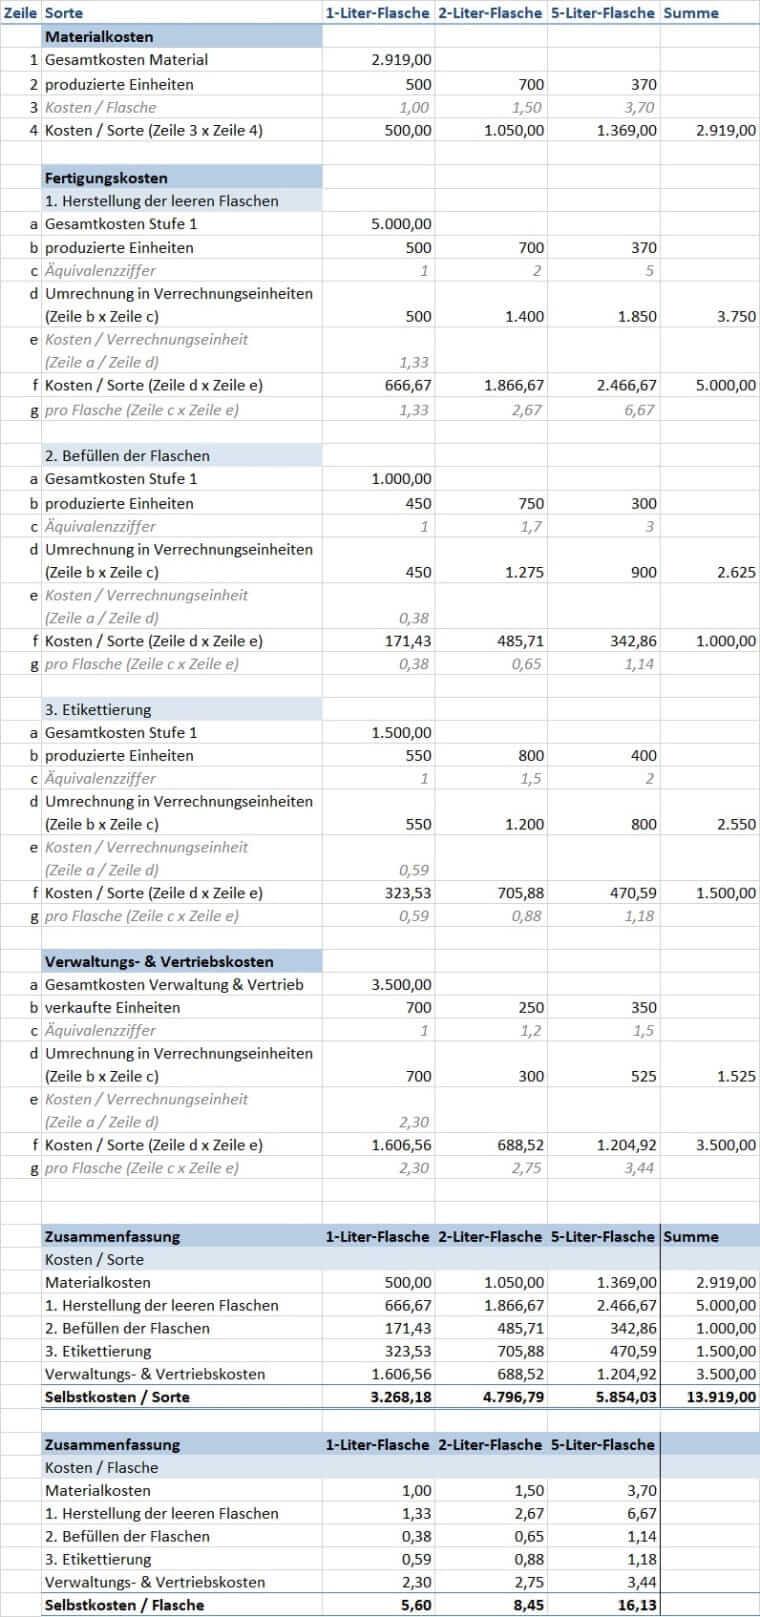 Mehrstufige Äquivalenzziffernkalkulation